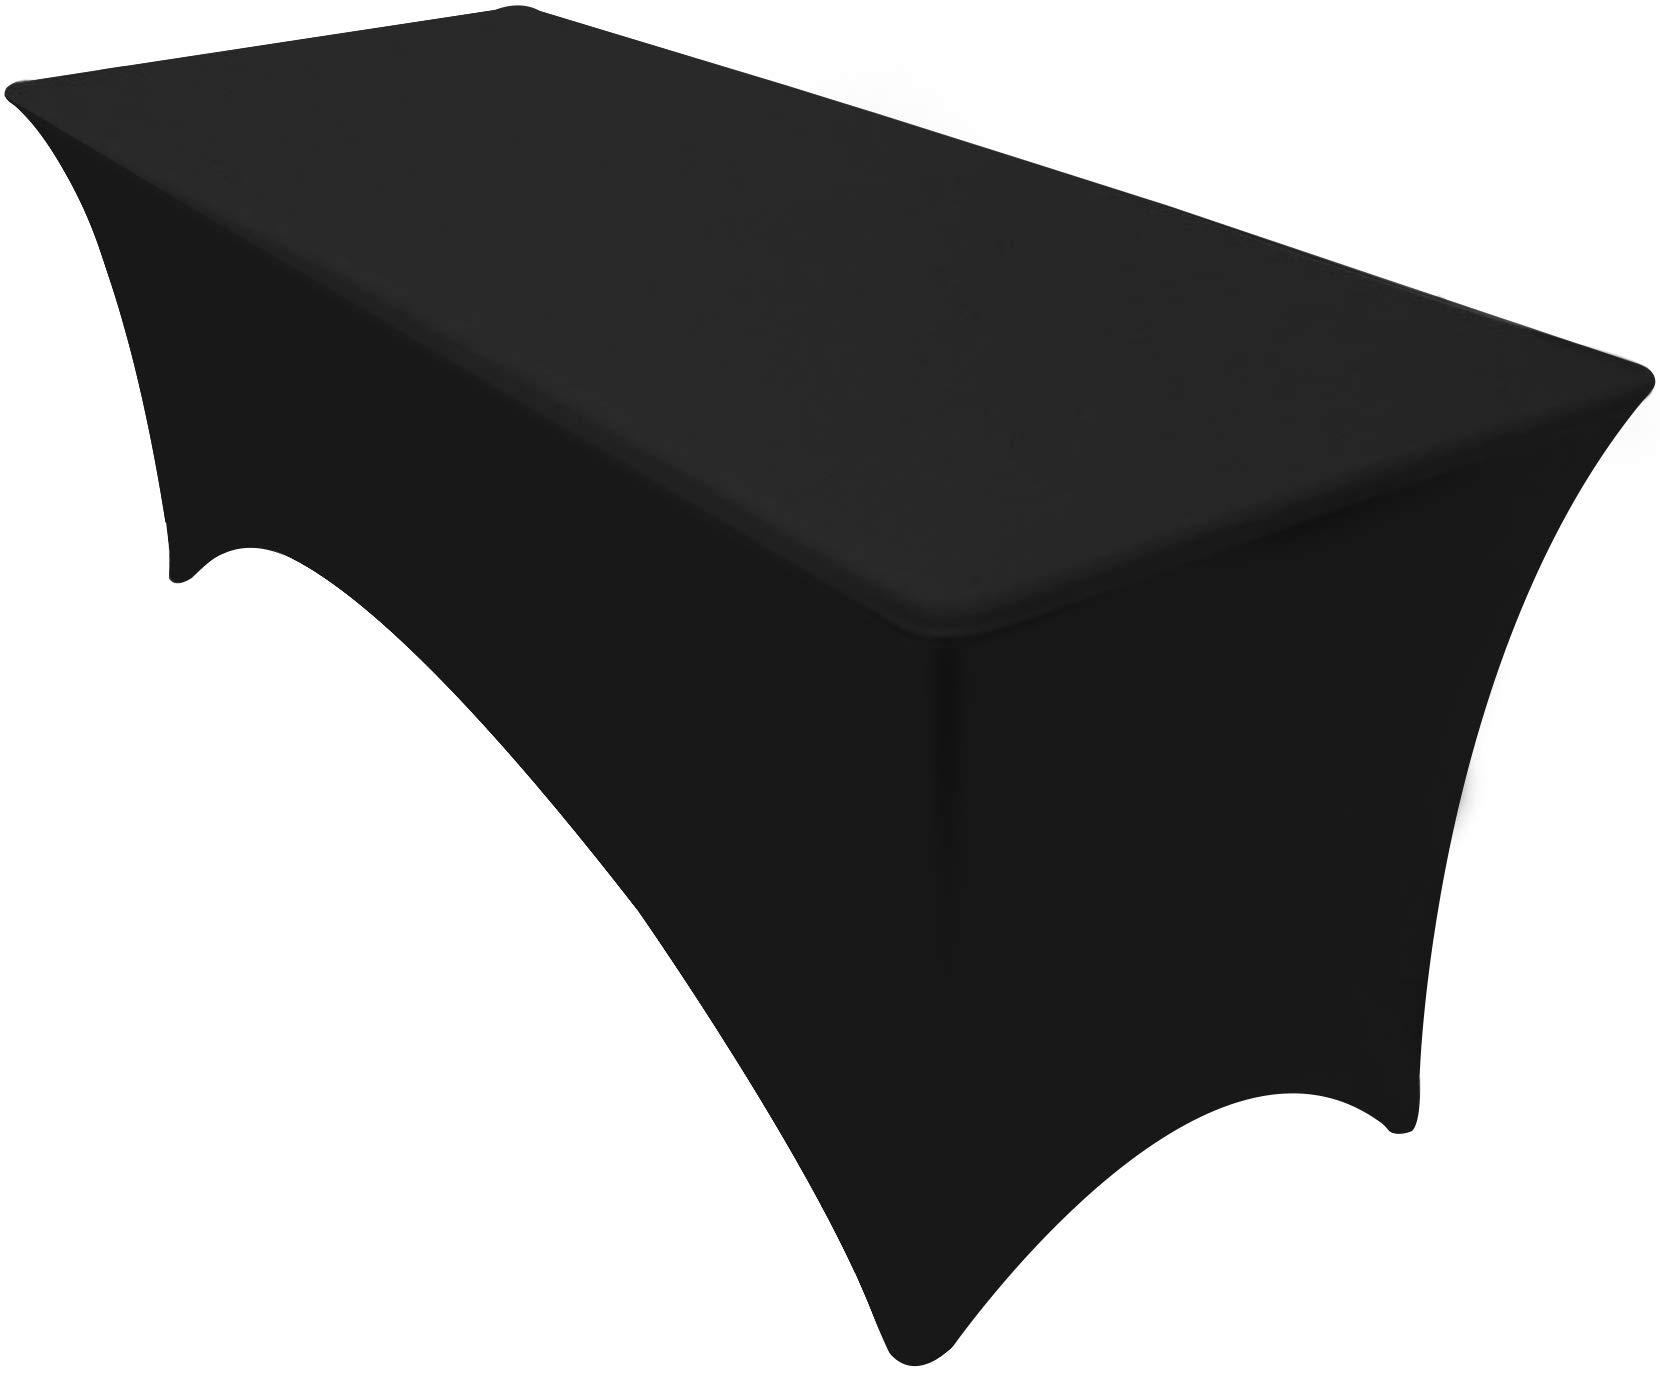 Utopia Kitchen Stretchable 8 Feet Black Tablecloth by Utopia Kitchen